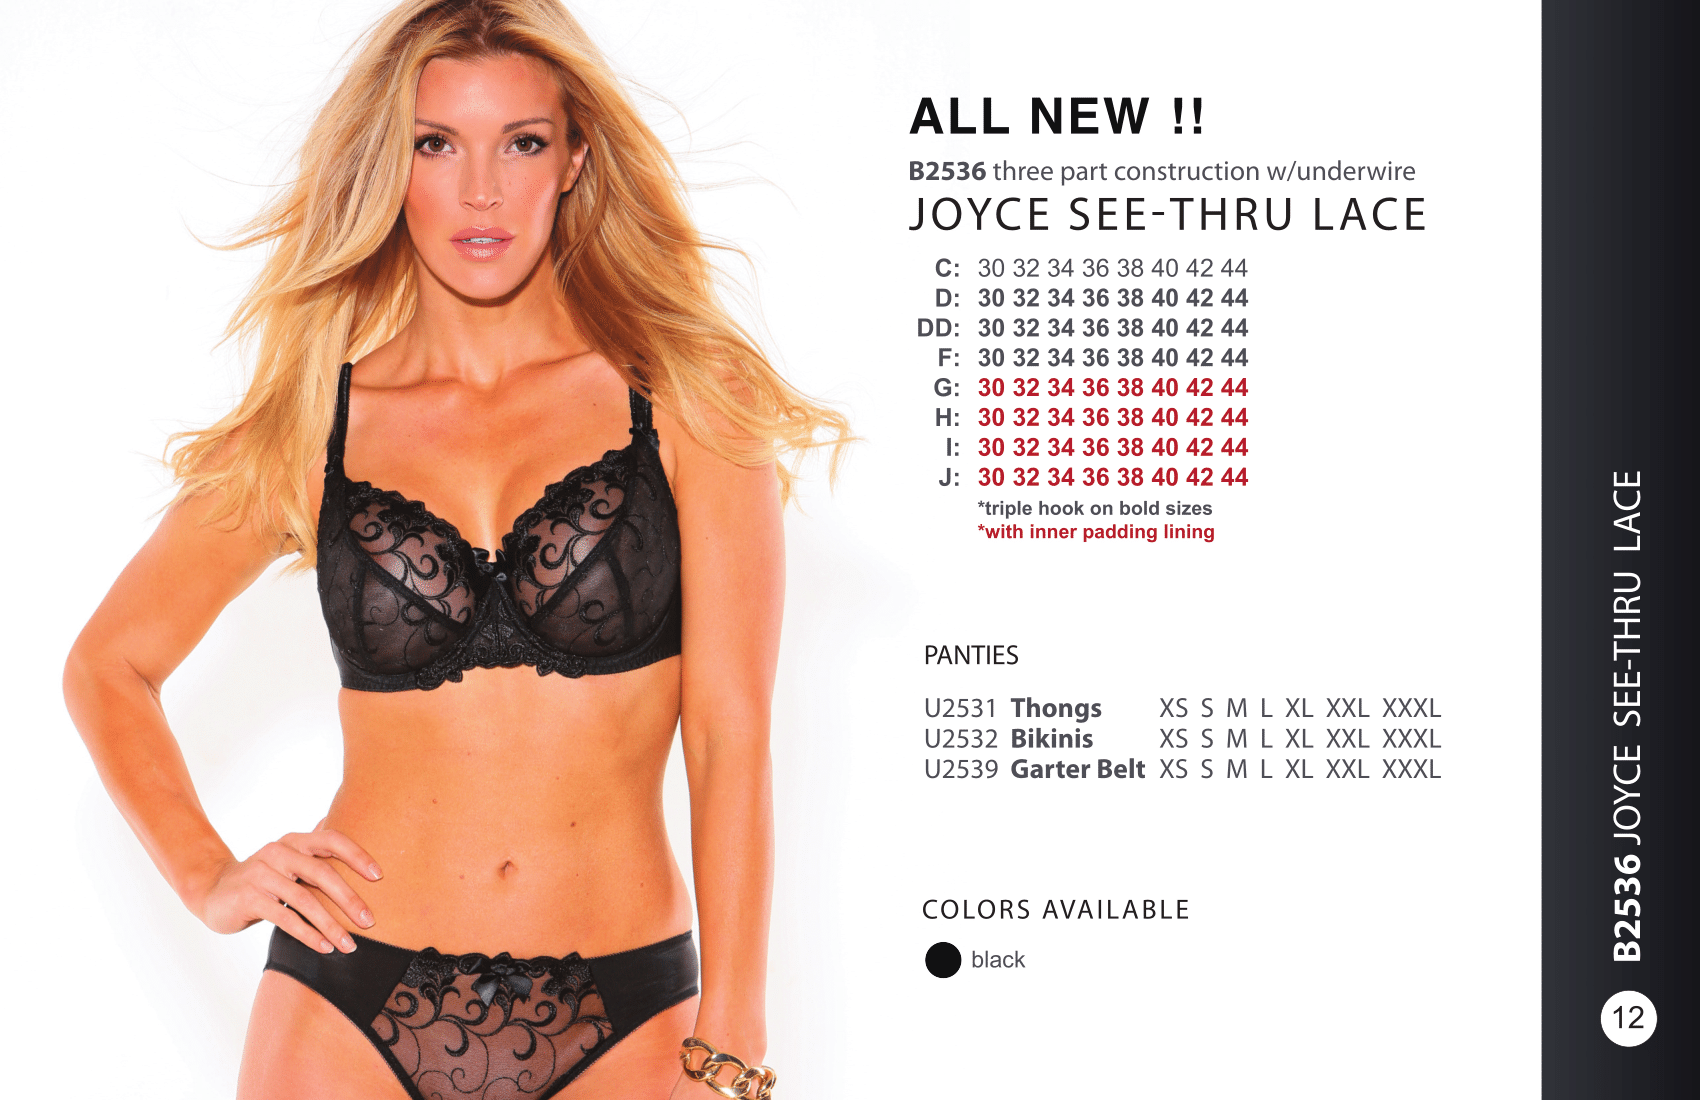 Joyce See-Thru Lace